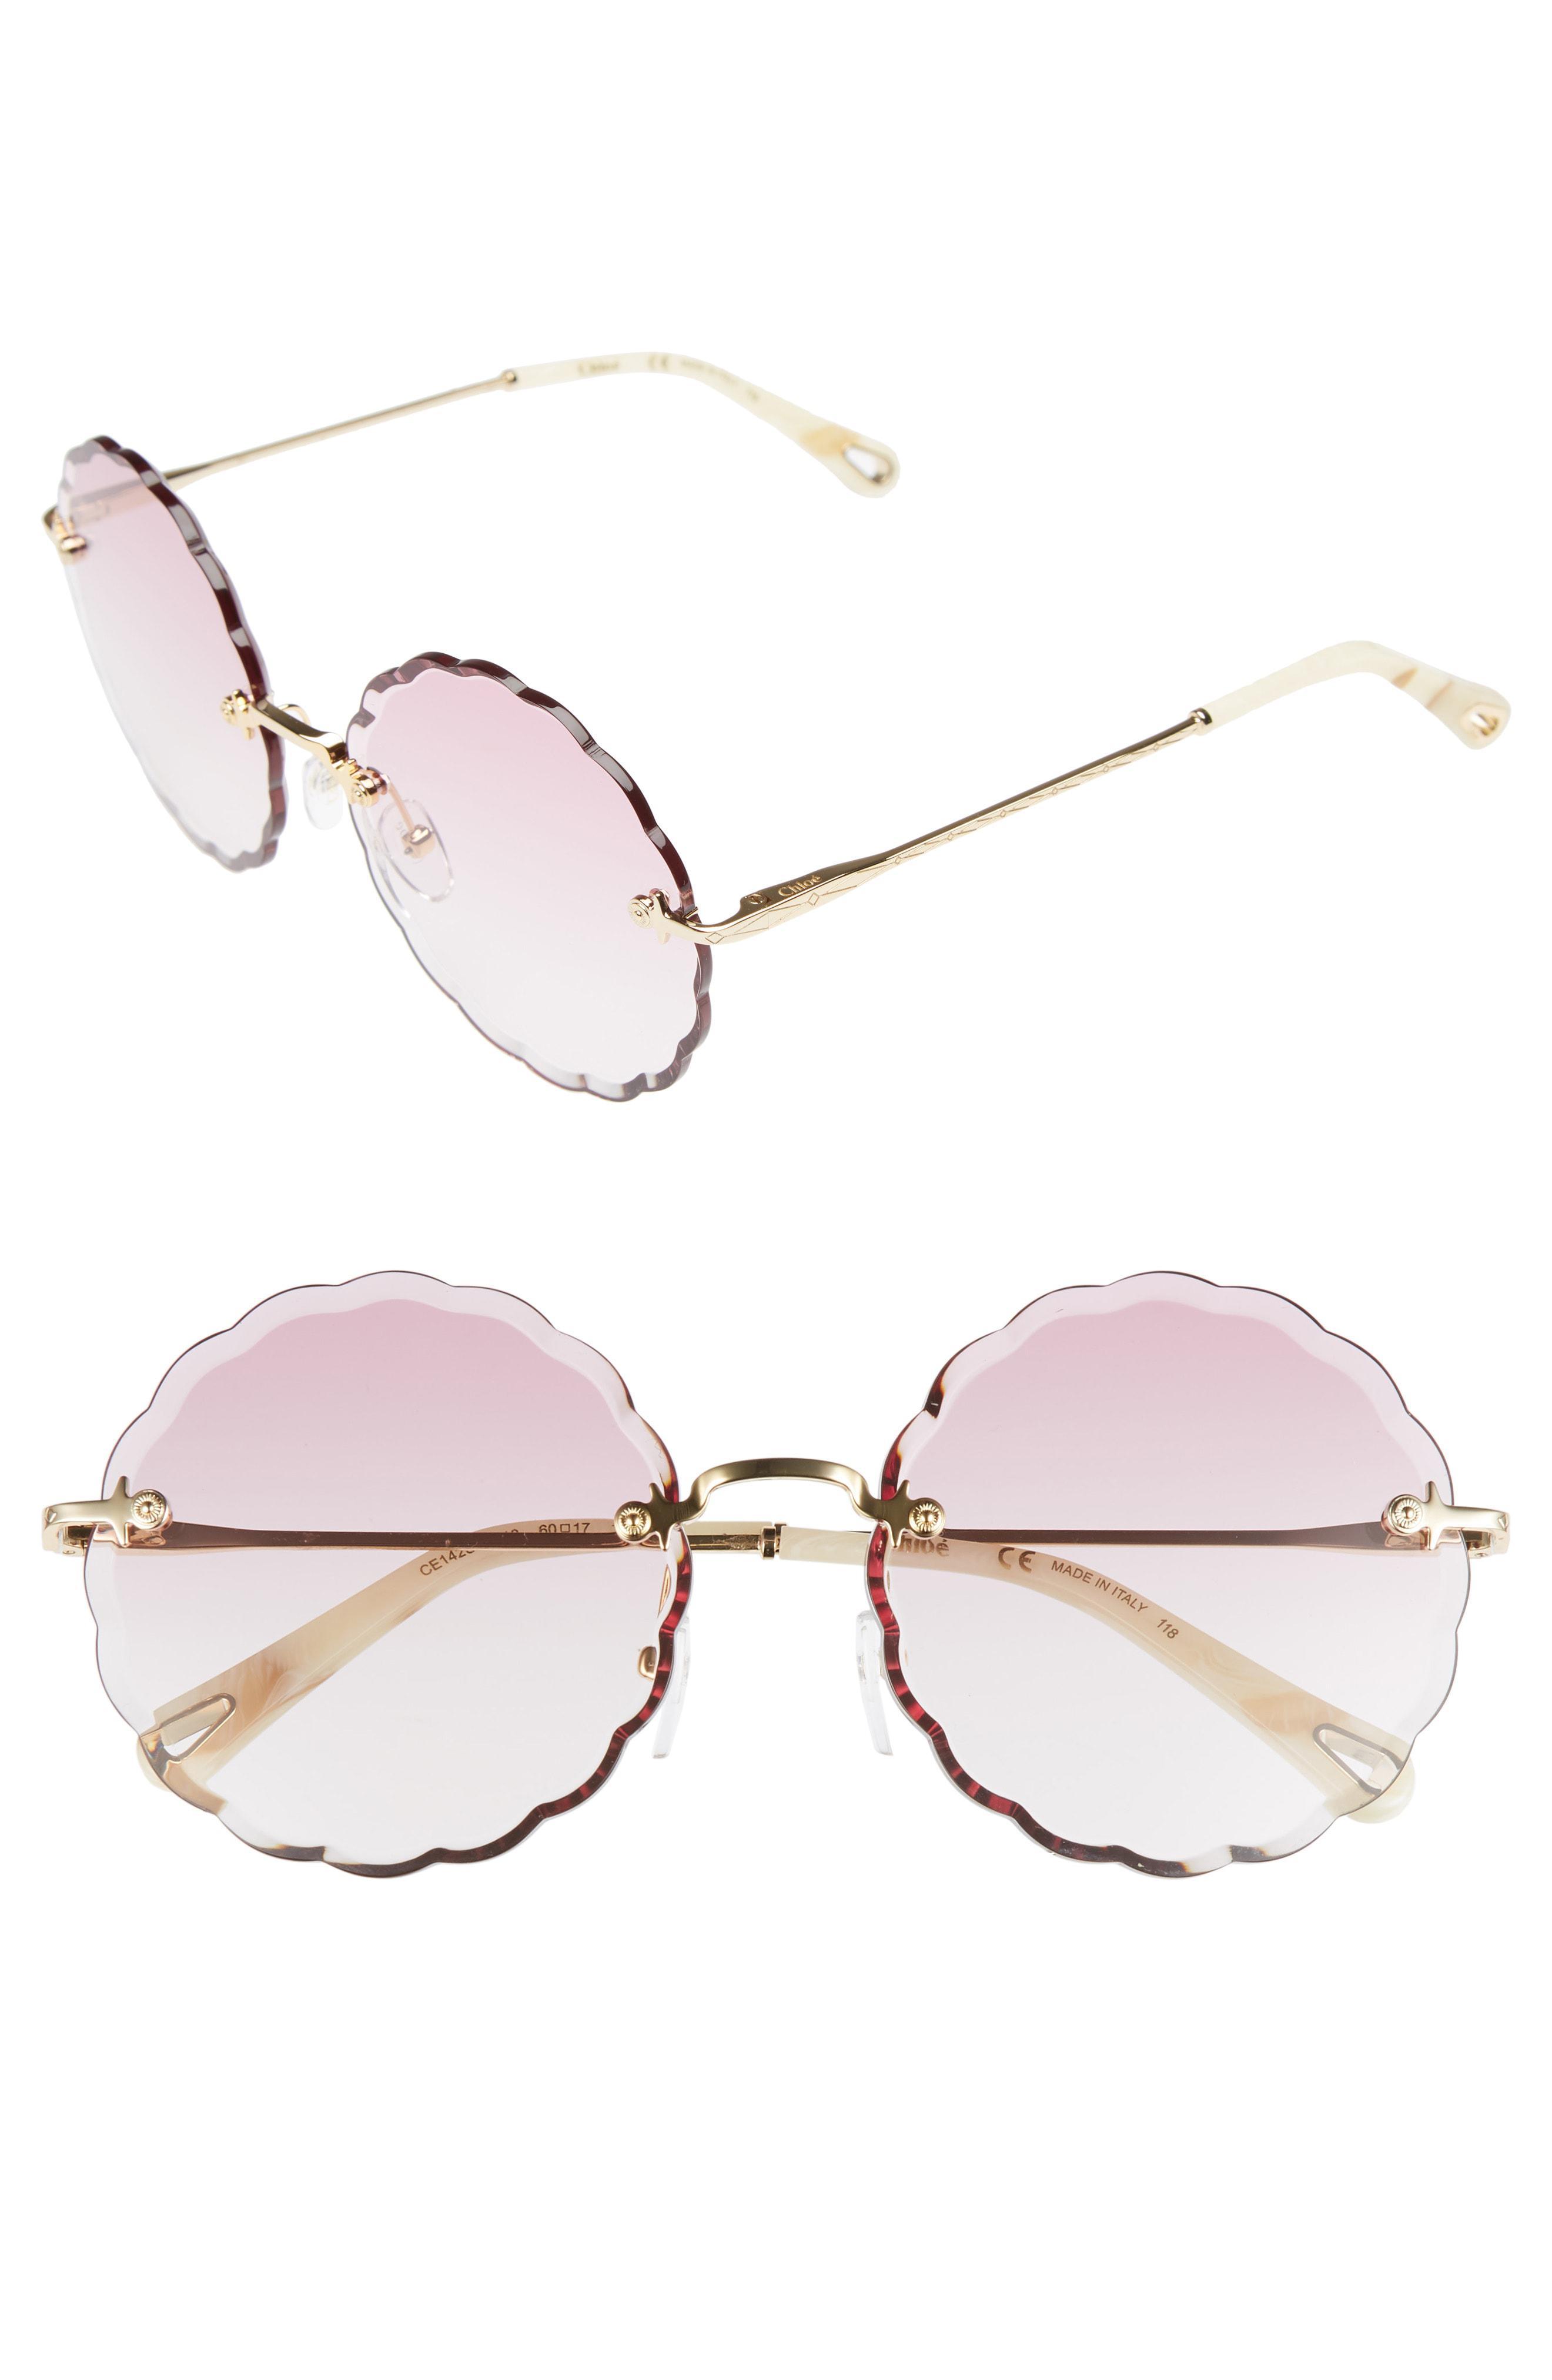 cbedd458067f Lyst - Chloé Rosie 60mm Scalloped Rimless Sunglasses